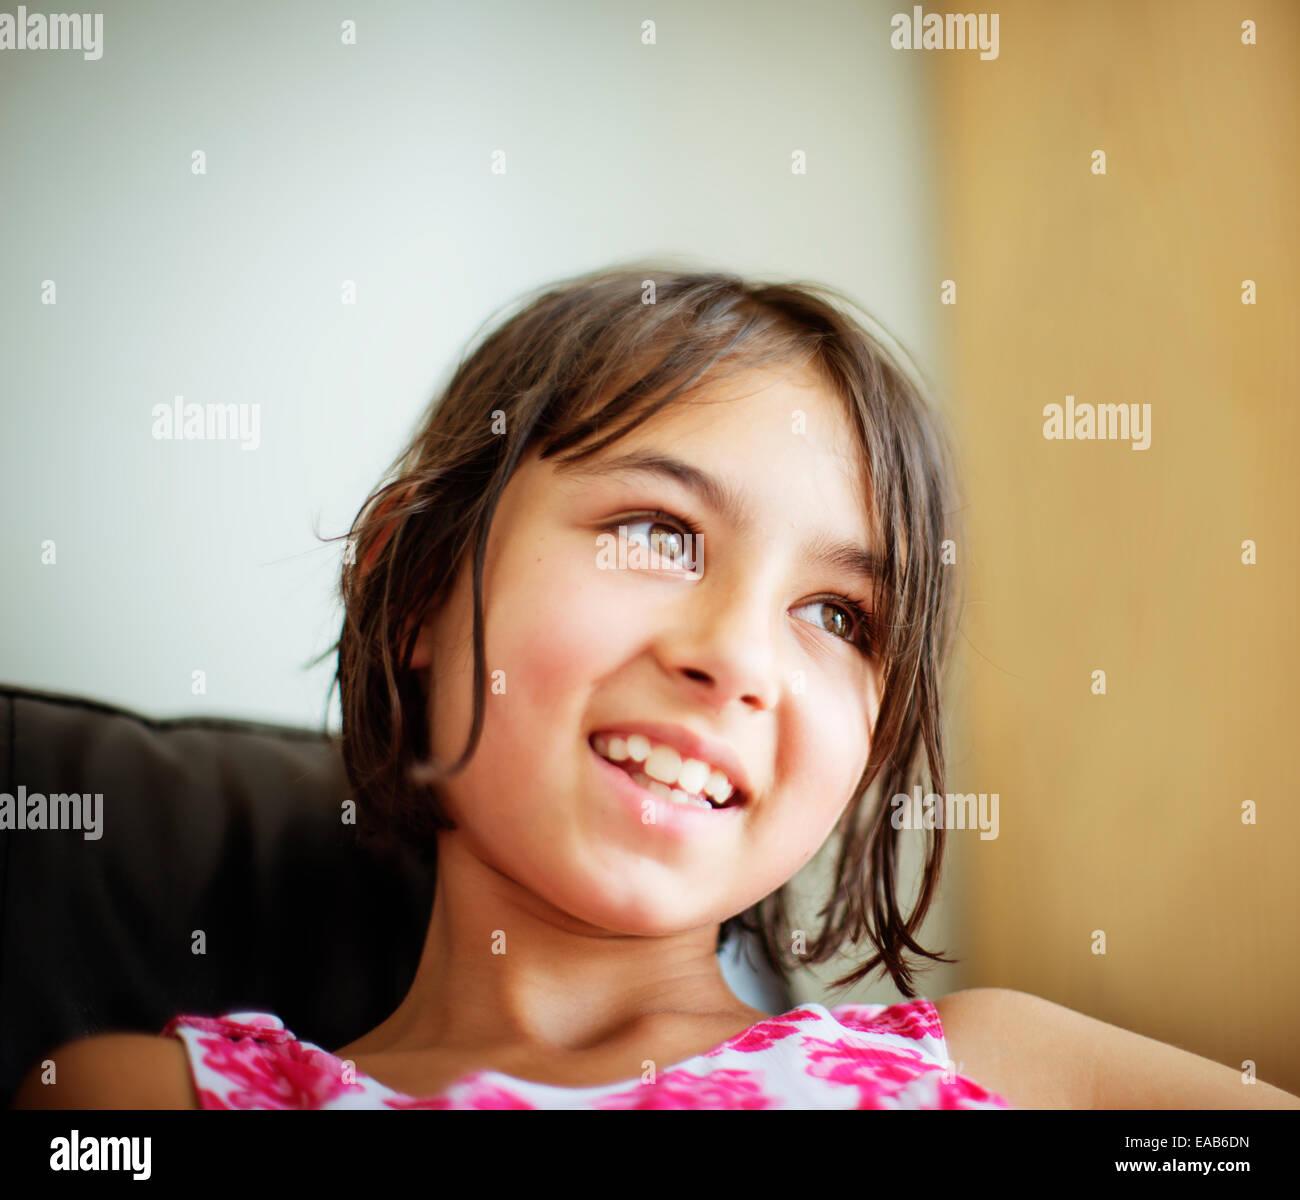 Smiling girl portrait - Stock Image